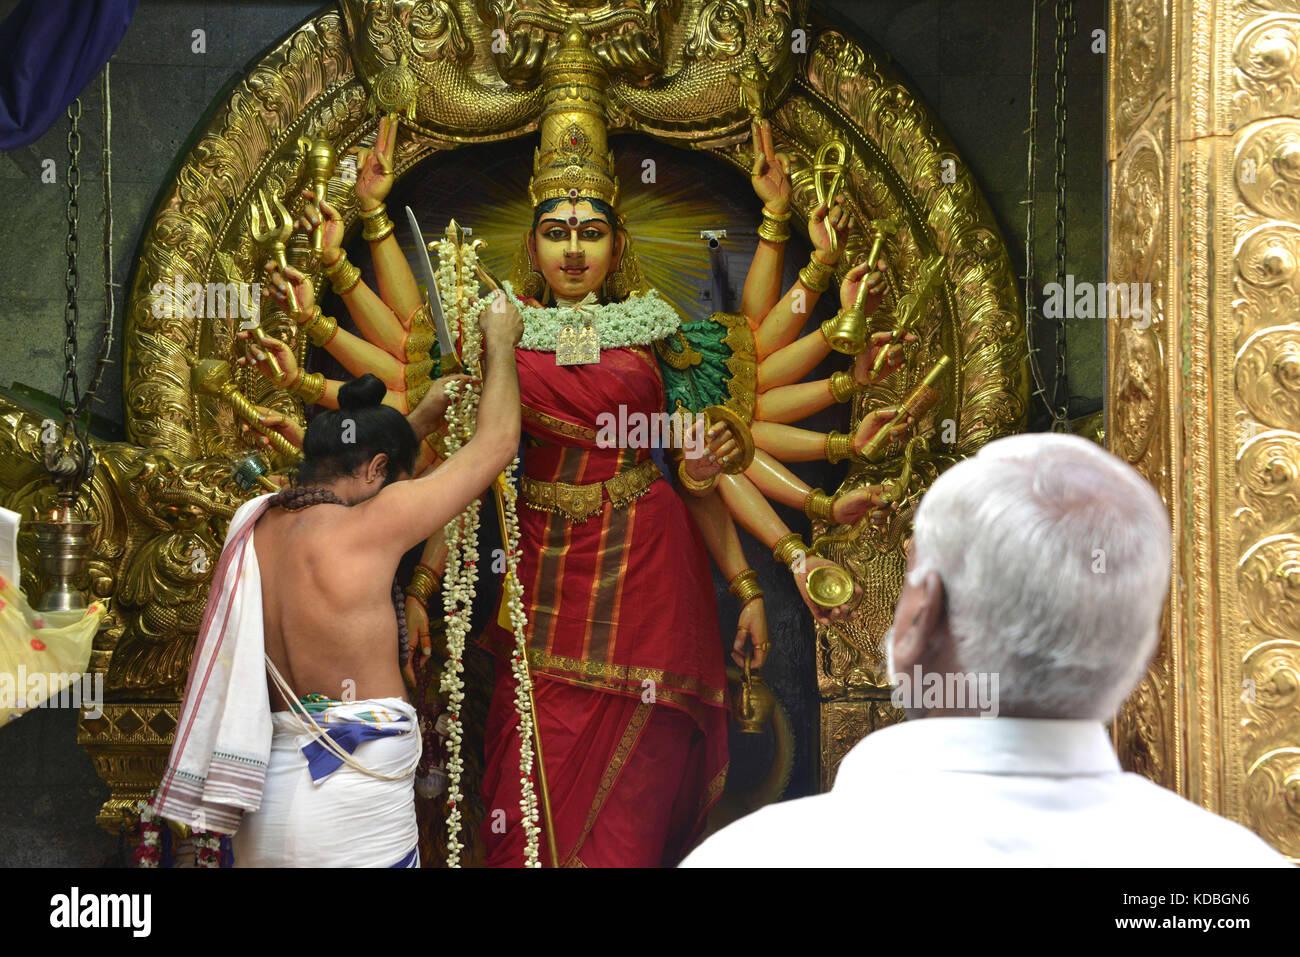 Singapore.  Serangoon Road, Little India District, believer bringing an offering in the Hindu temple Sri Veeramakaliamman, - Stock Image